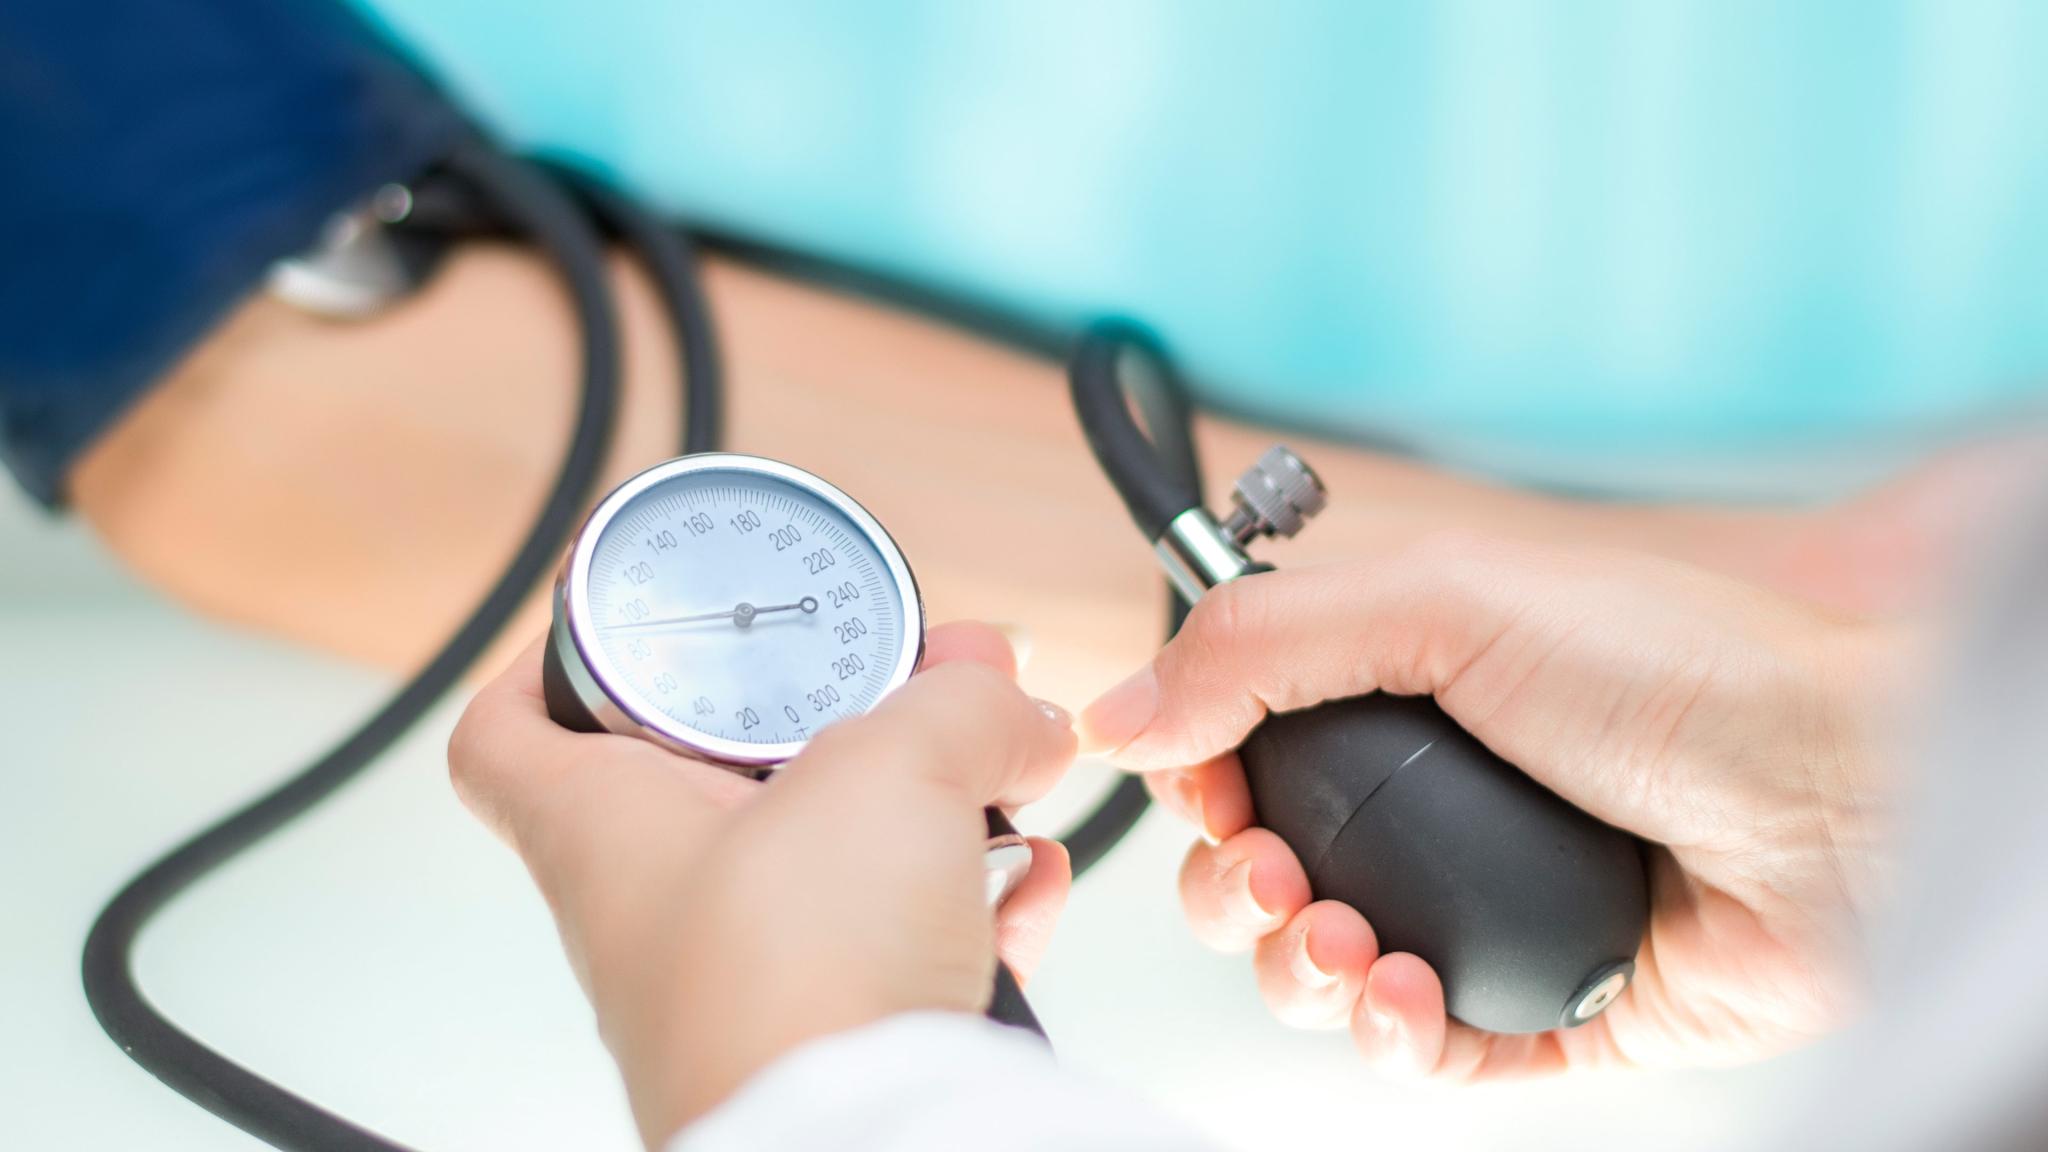 kardamom magas vérnyomás esetén 30 évig magas vérnyomásom van